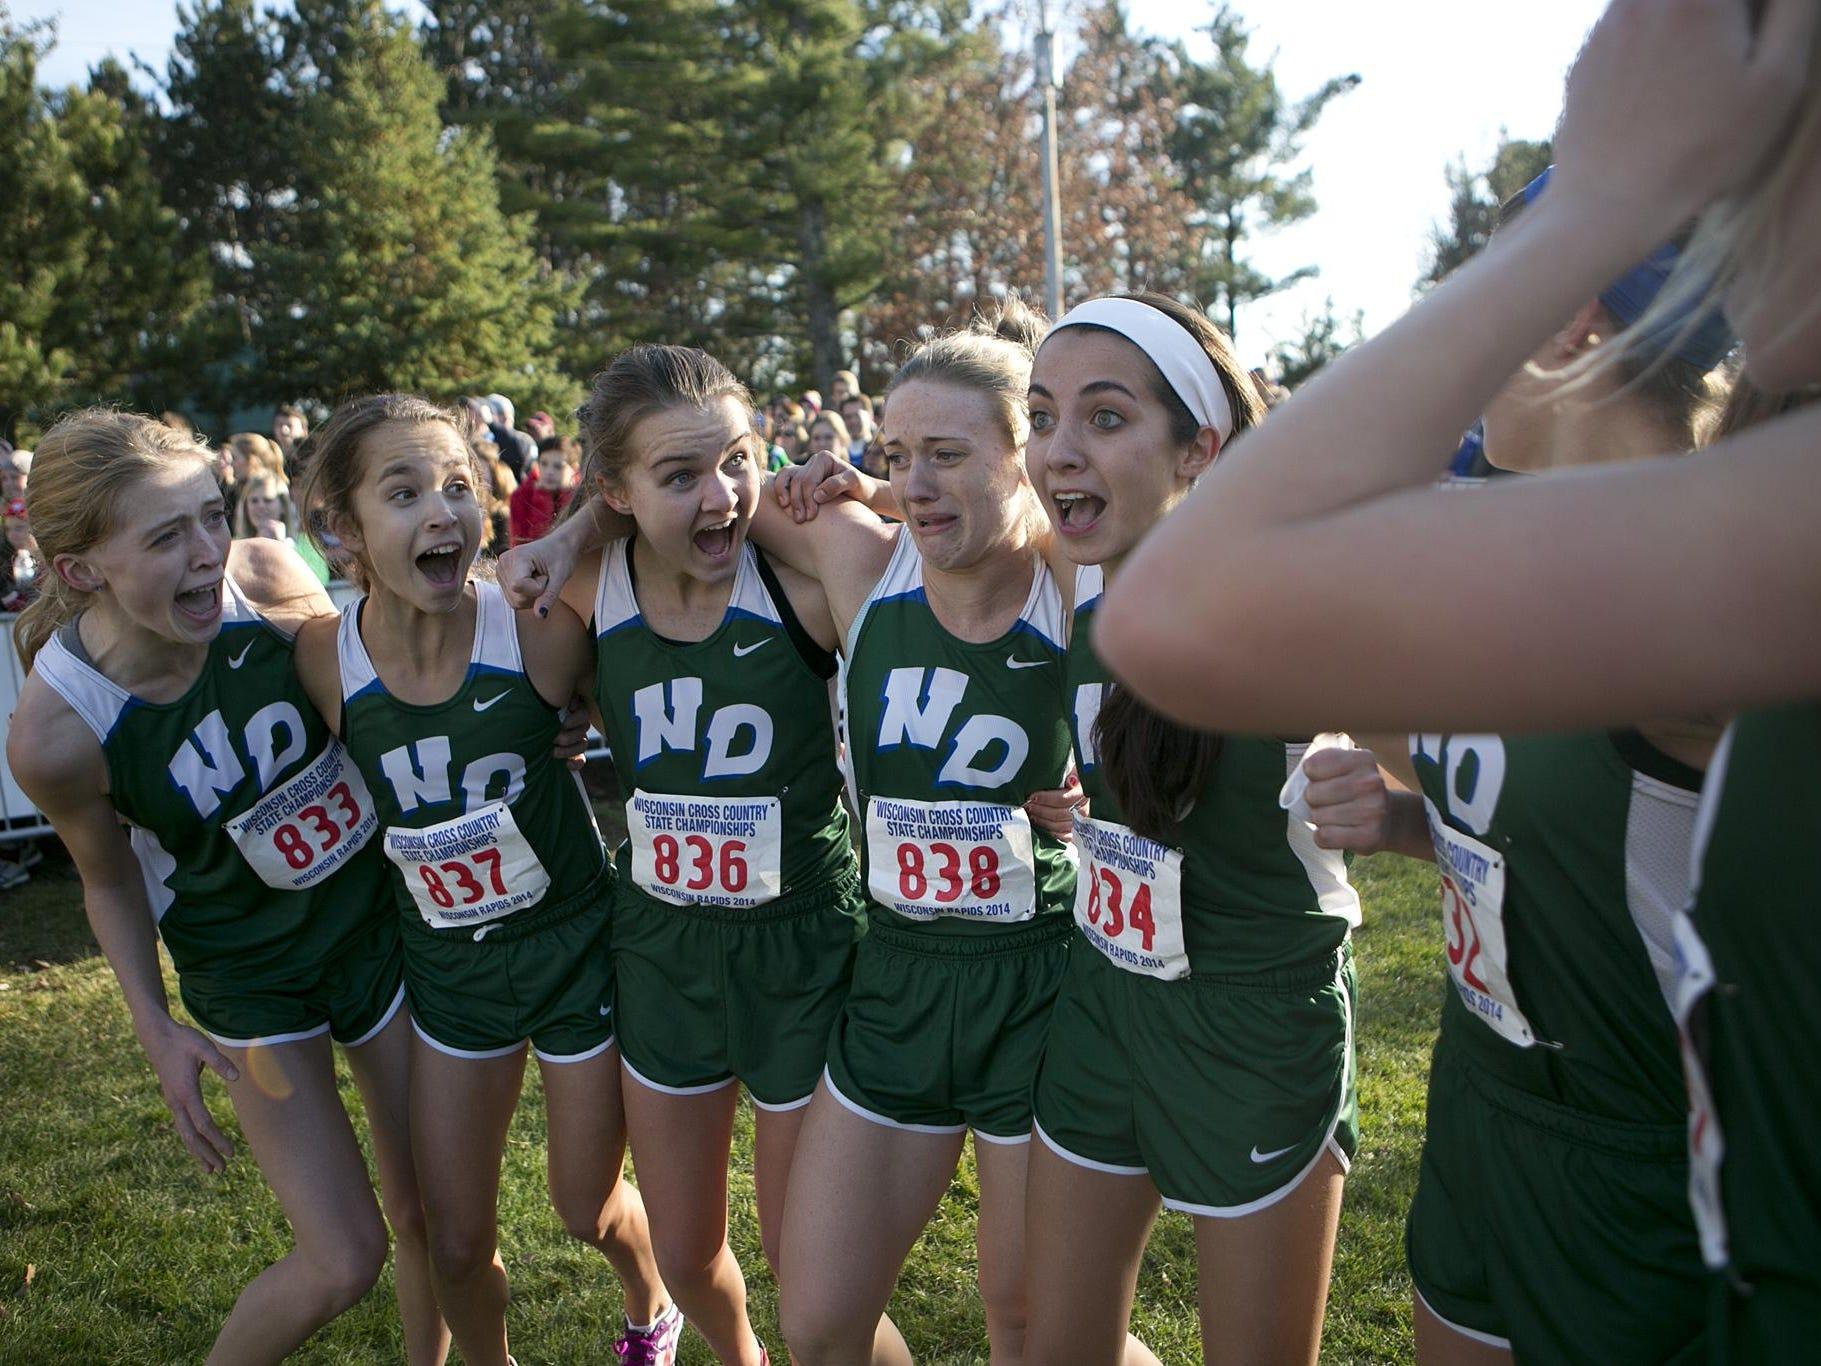 From left, Notre Dame's Kelley Gardipee, Ashley Laskowski, Anna Patterson, Kristen Burkel, Jessica Reigh, Maria Ehlinger and Veronica Letter celebrate the Tritons' championship.